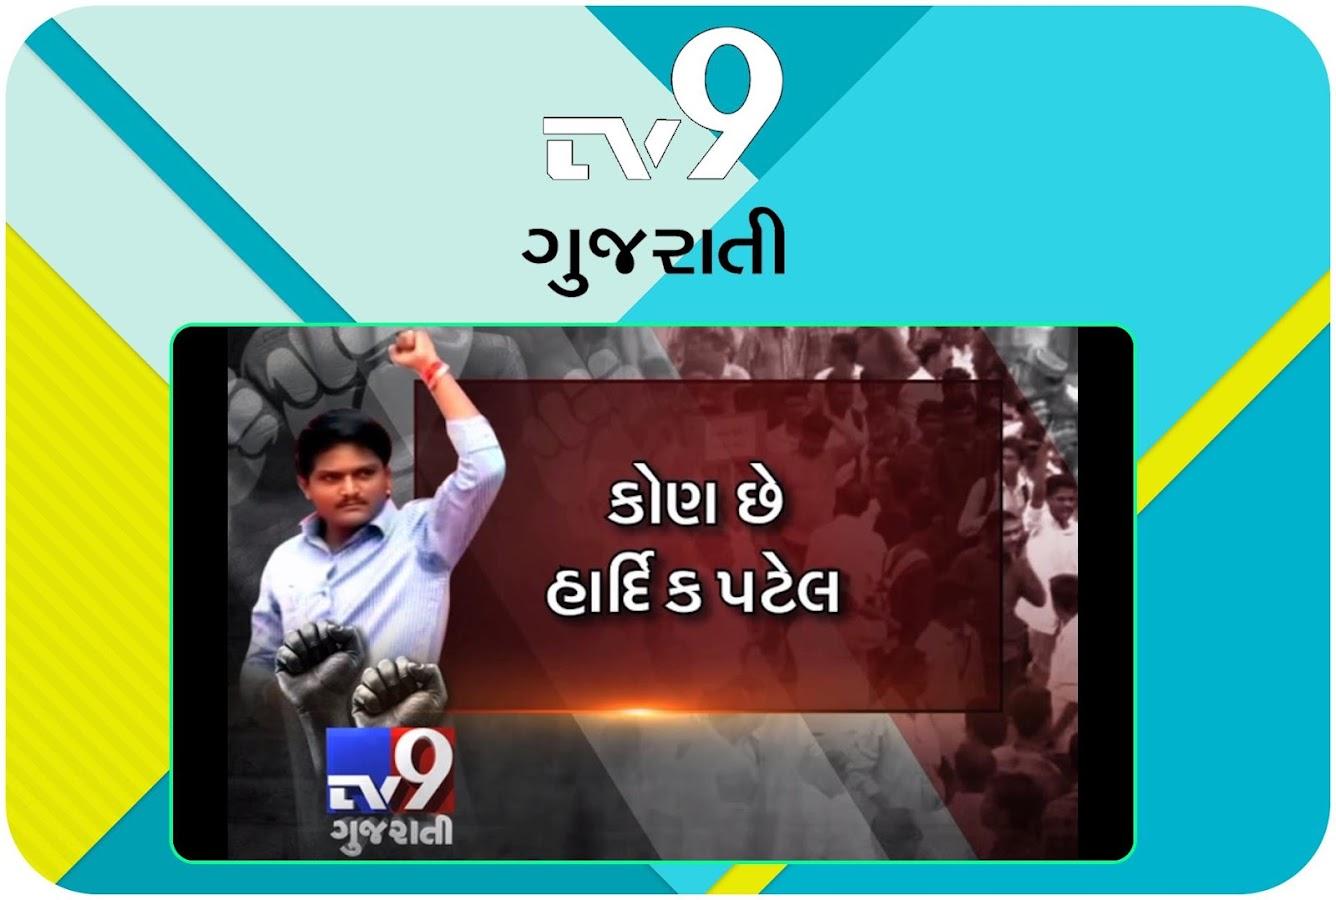 TV9 Gujarati Live News 1 4 APK Download - Android News